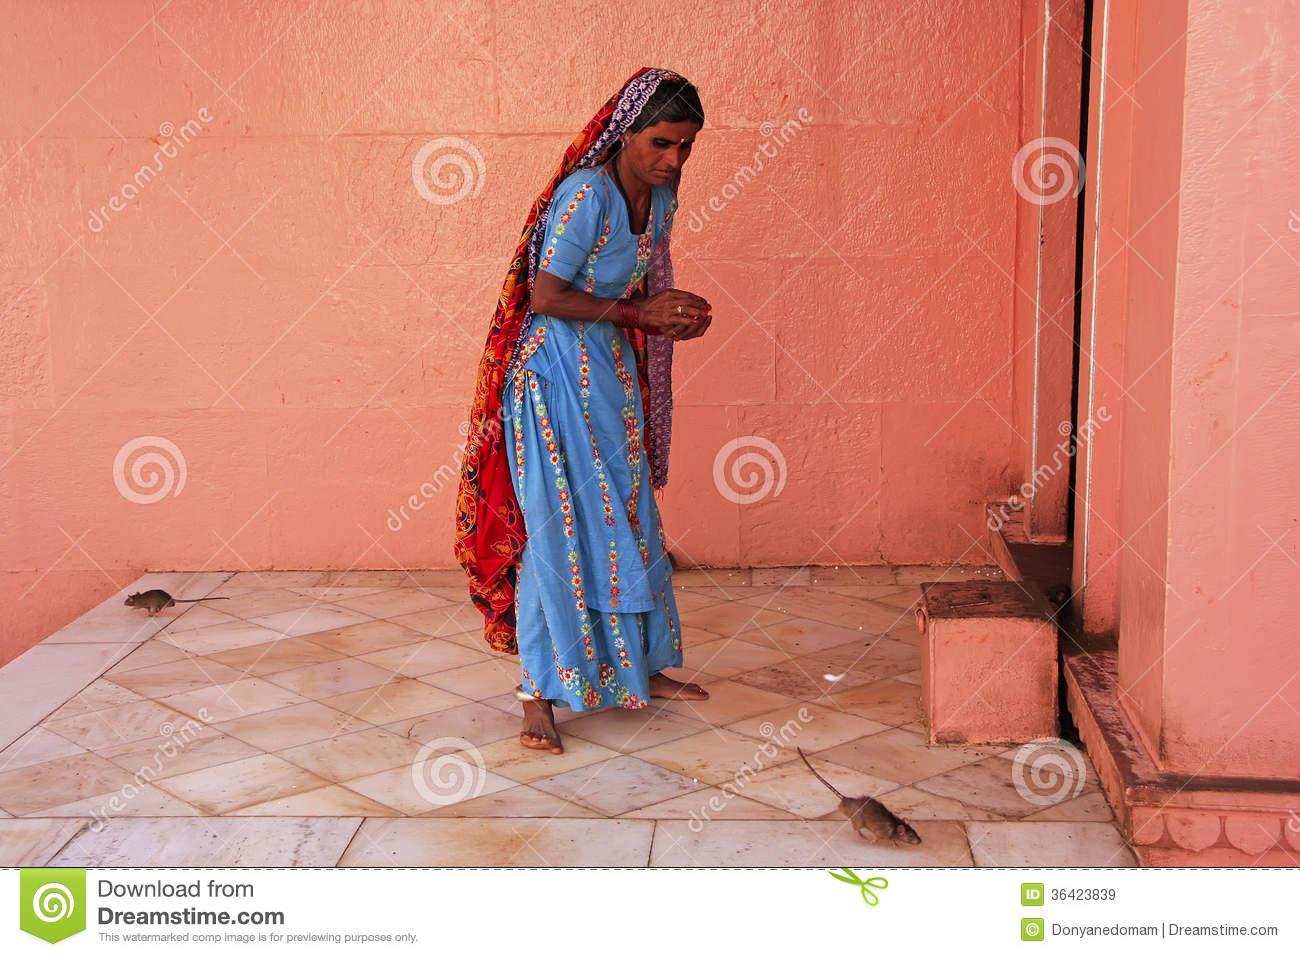 Indian Woman Offering Food For Rats, Karni Mata Temple, Deshnok.